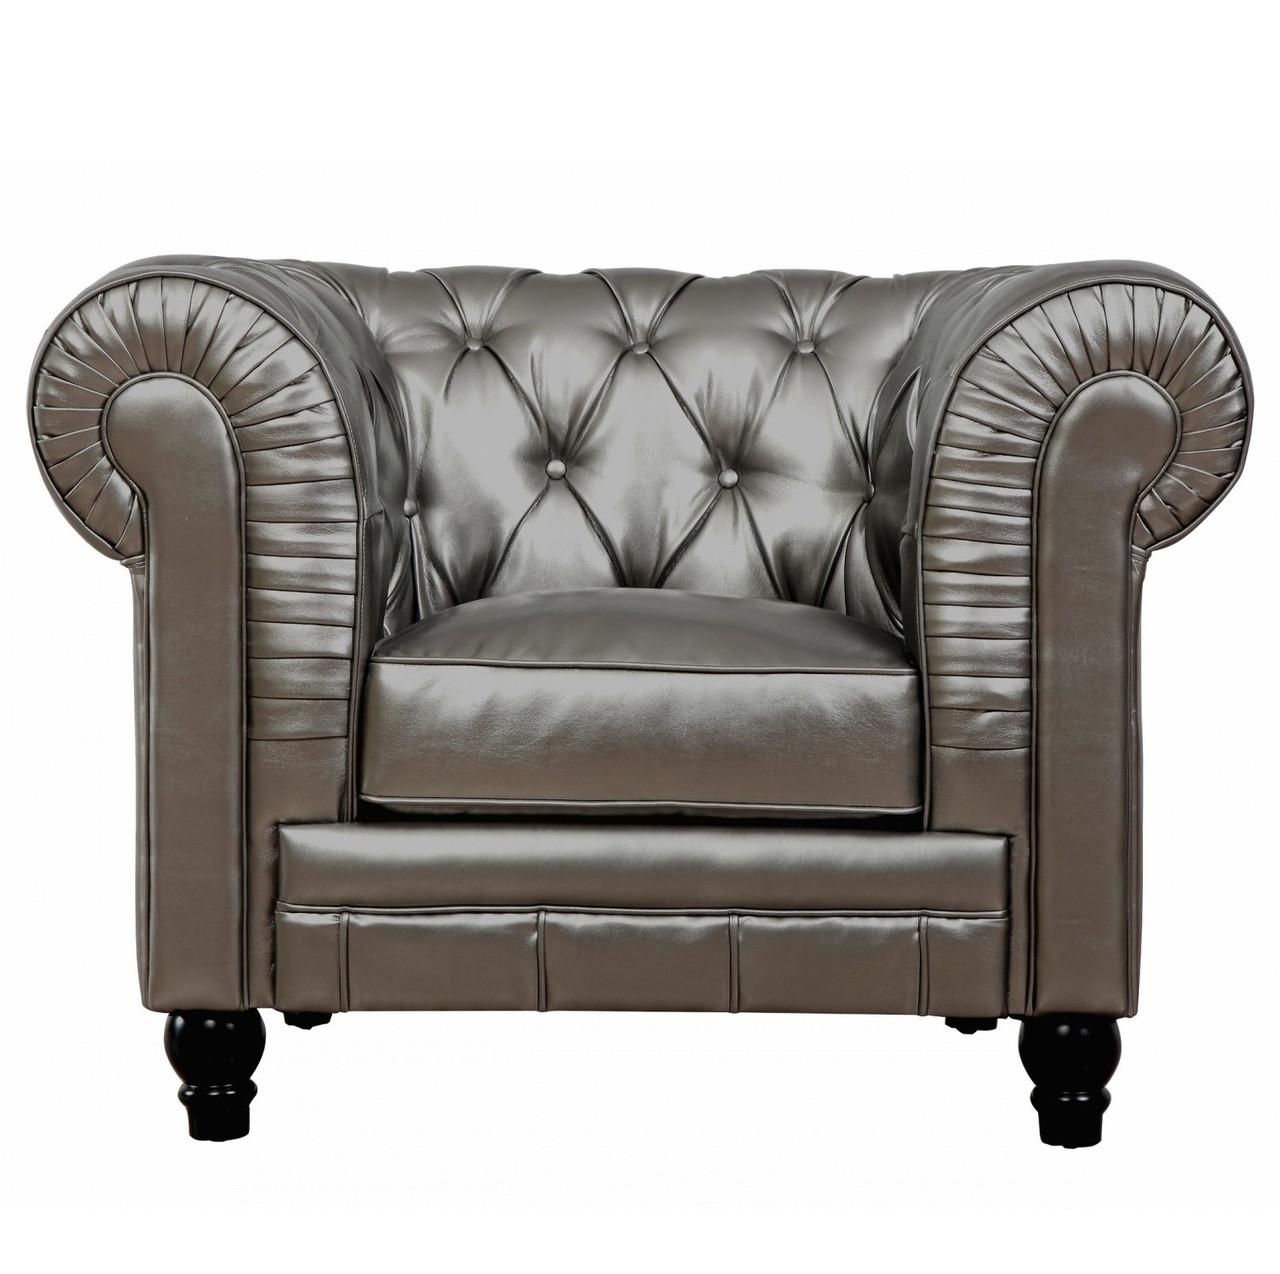 Zahara Silver Leather Chesterfield Club Chair Zin Home